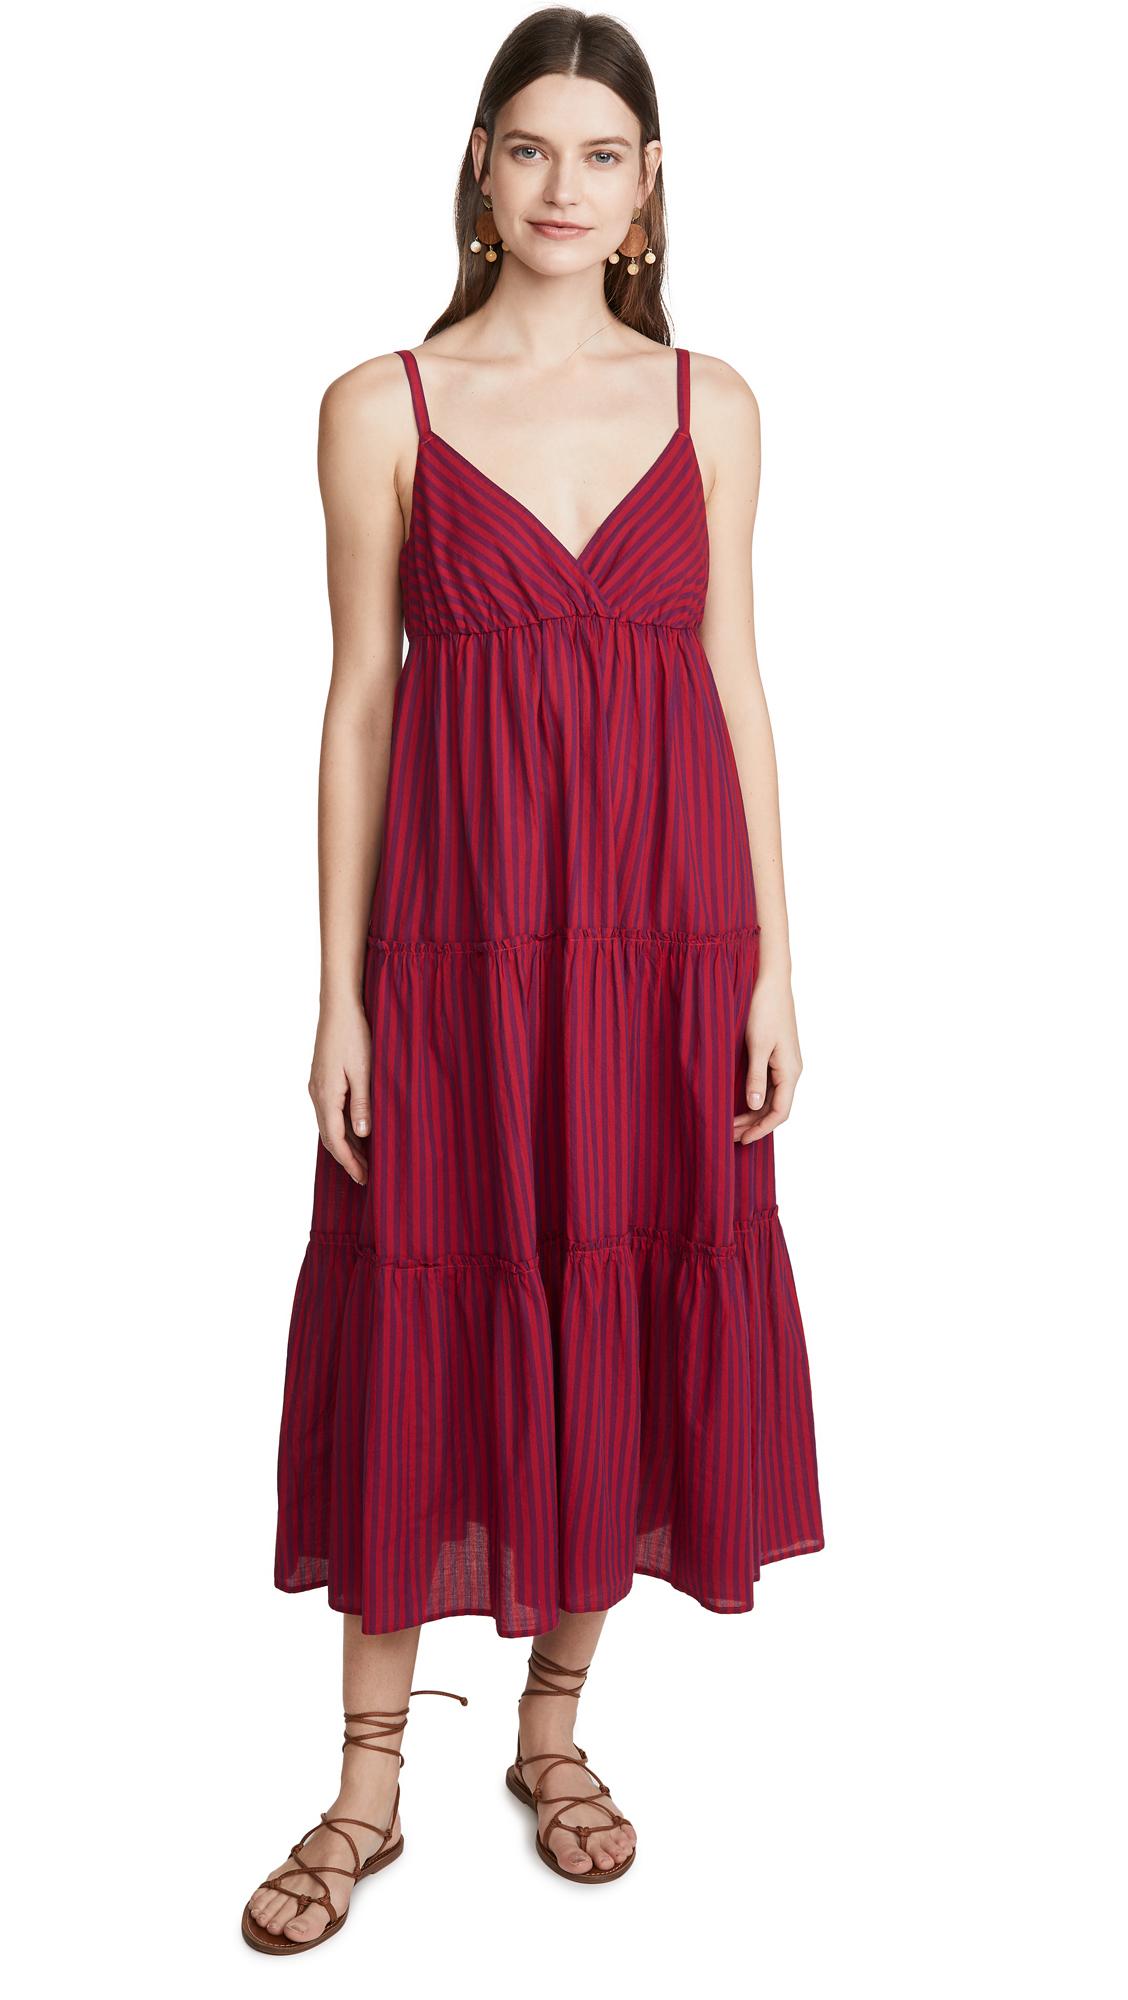 XIRENA Mae Dress - 30% Off Sale